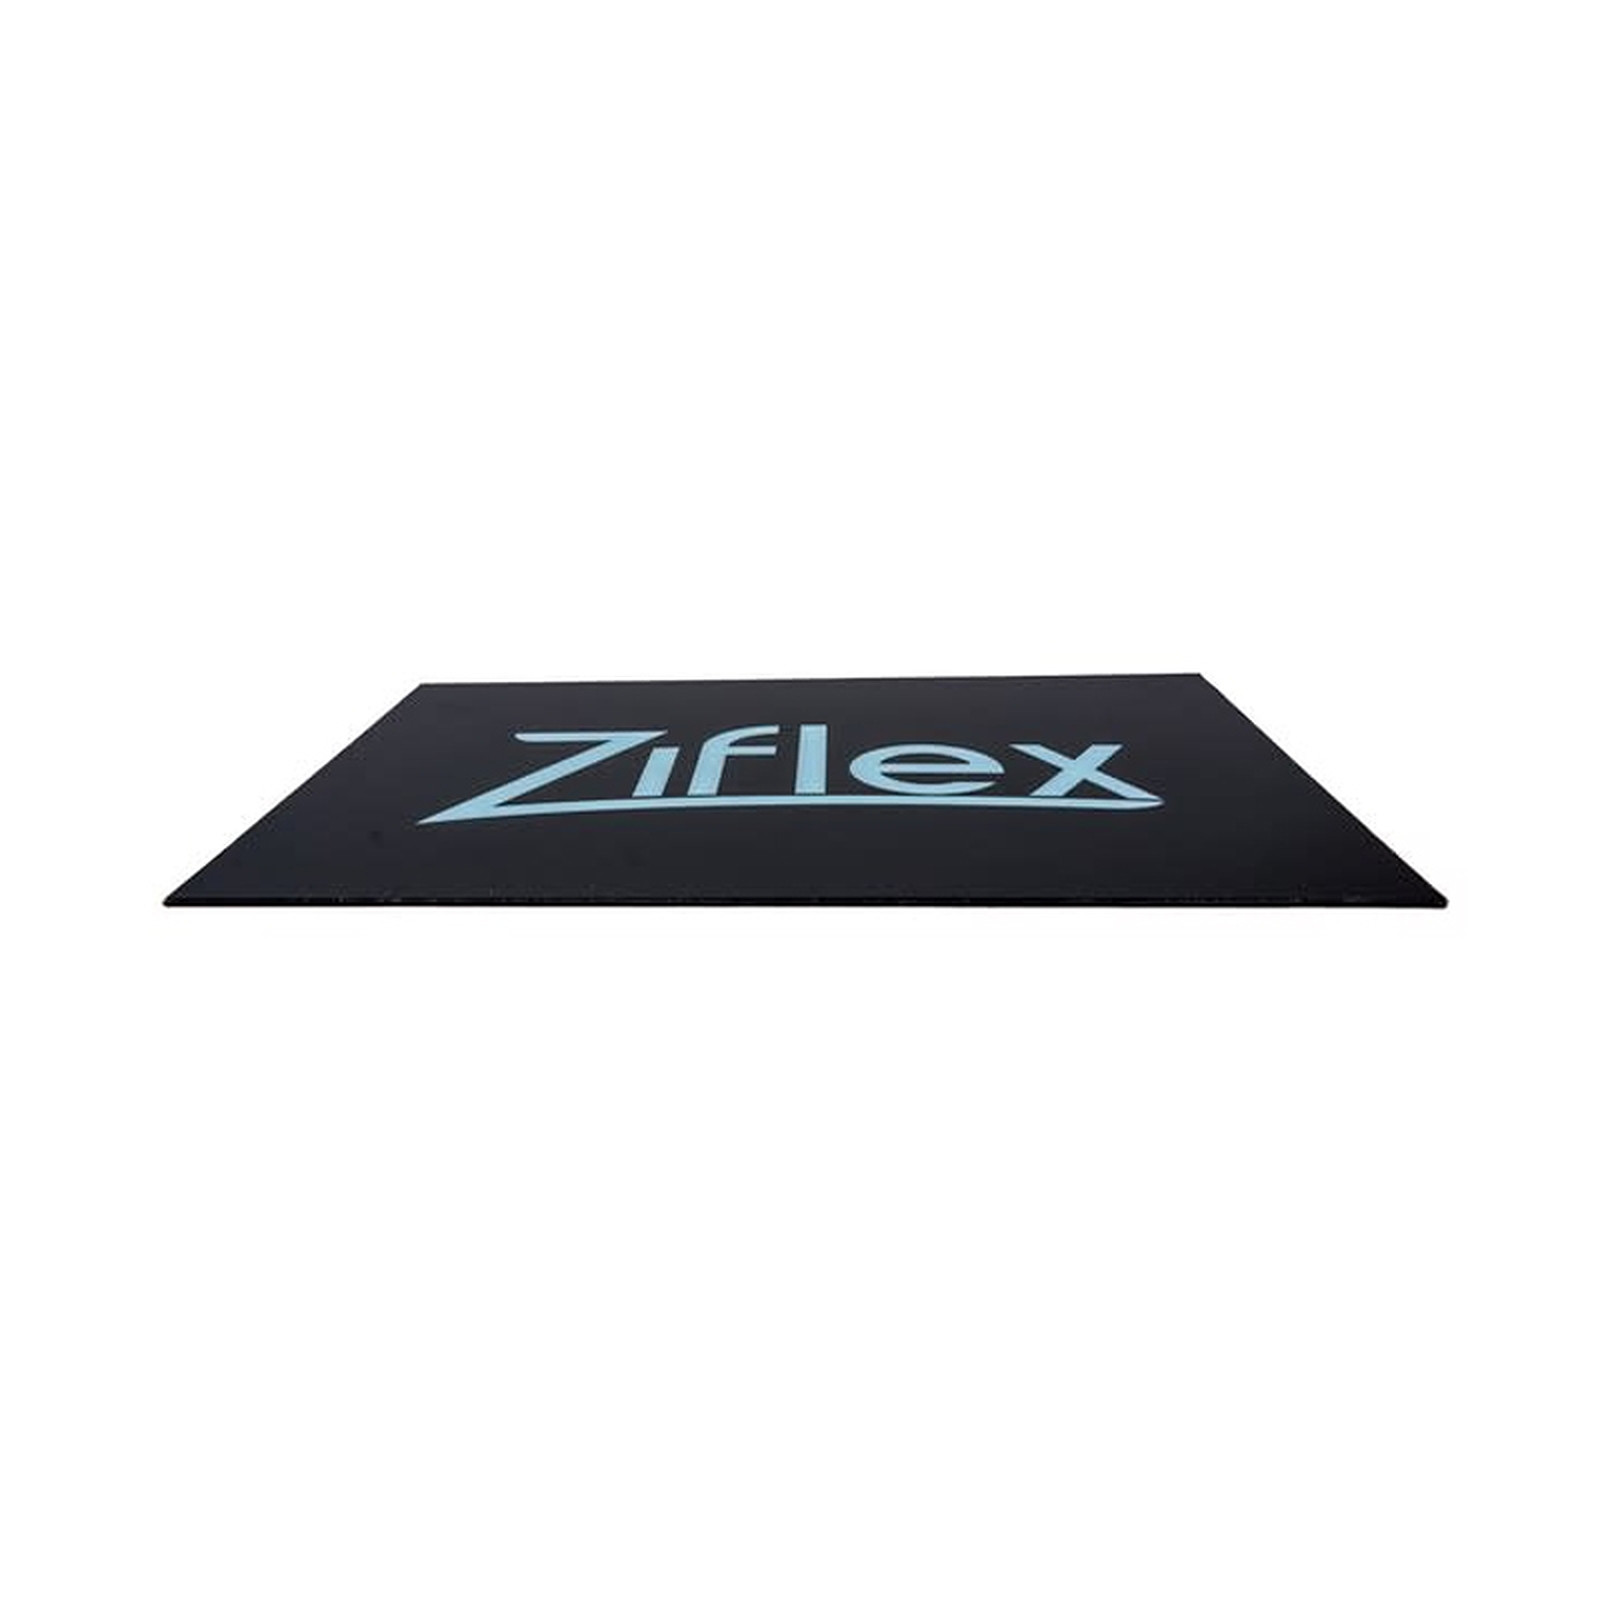 Zimple Ziflex Creality3D Ender 3